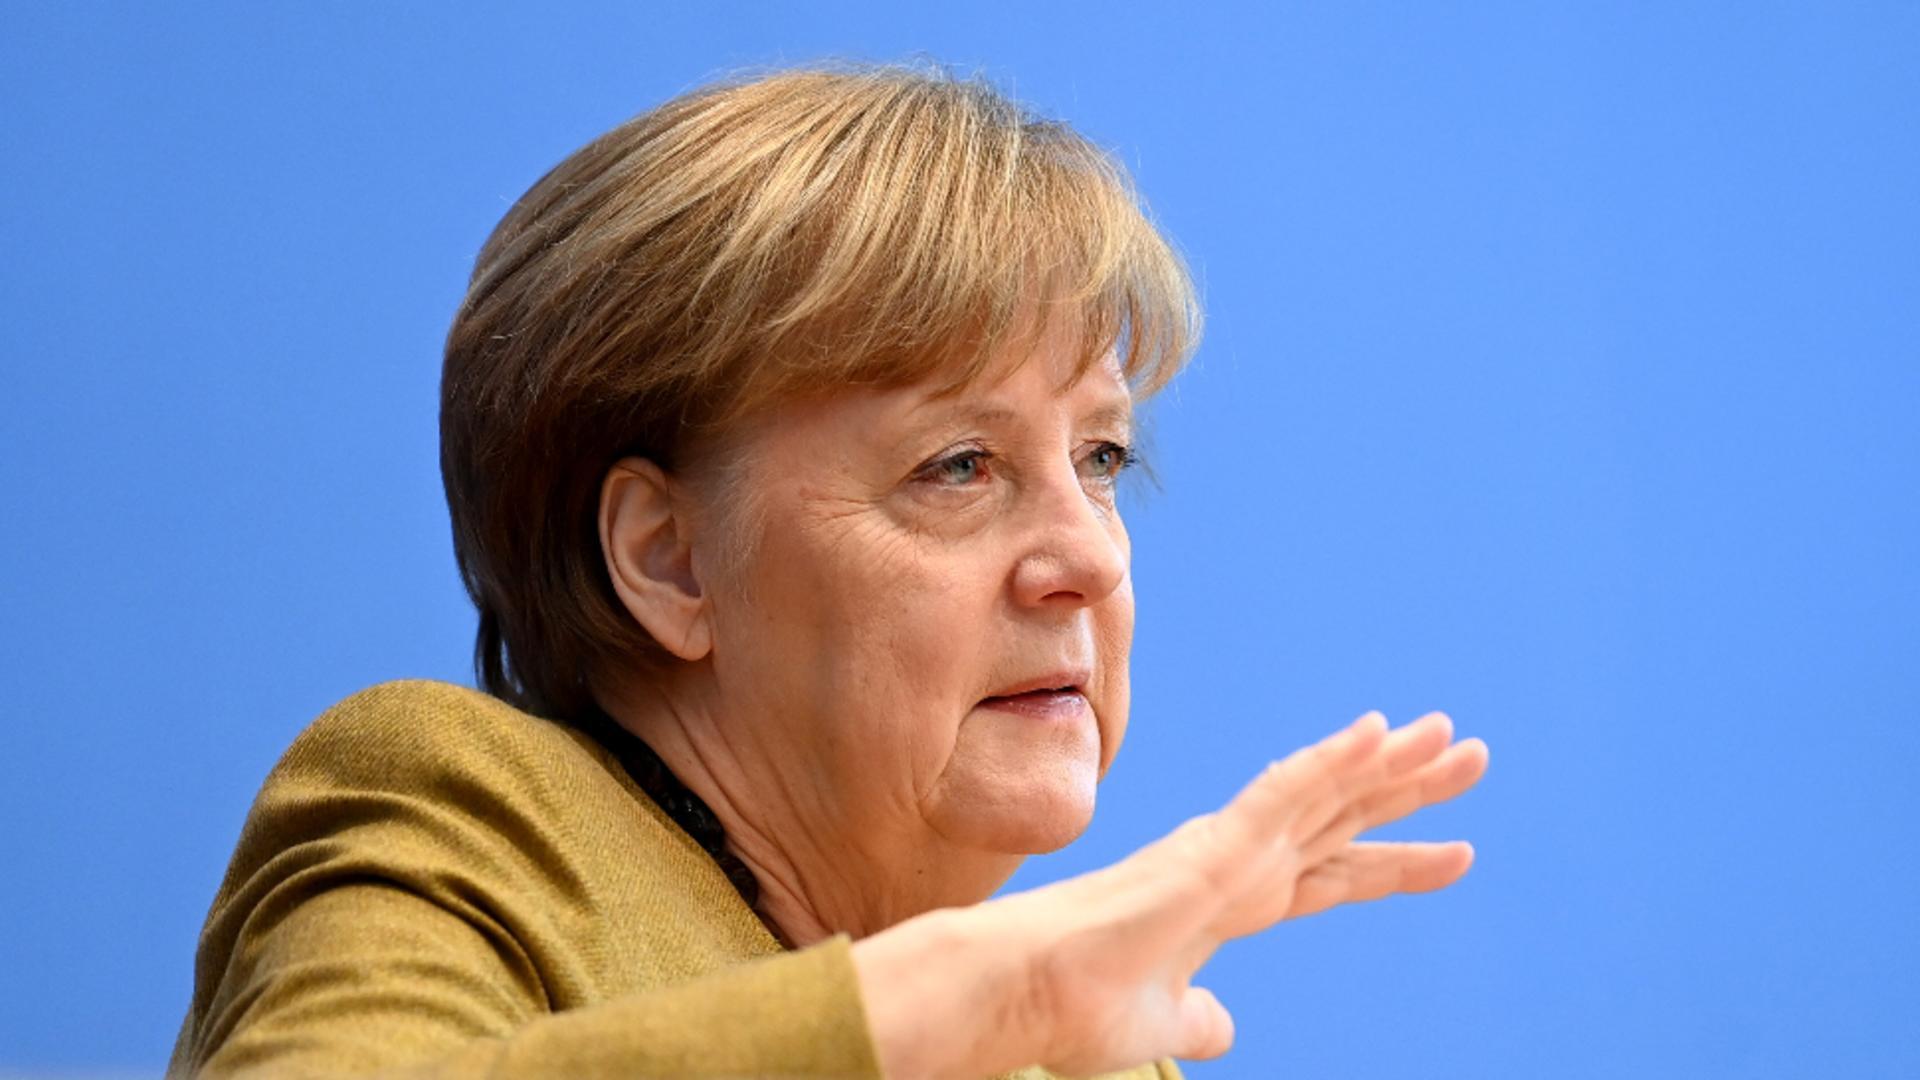 Cancelarul Angela Merkel / Foto: Profi Media